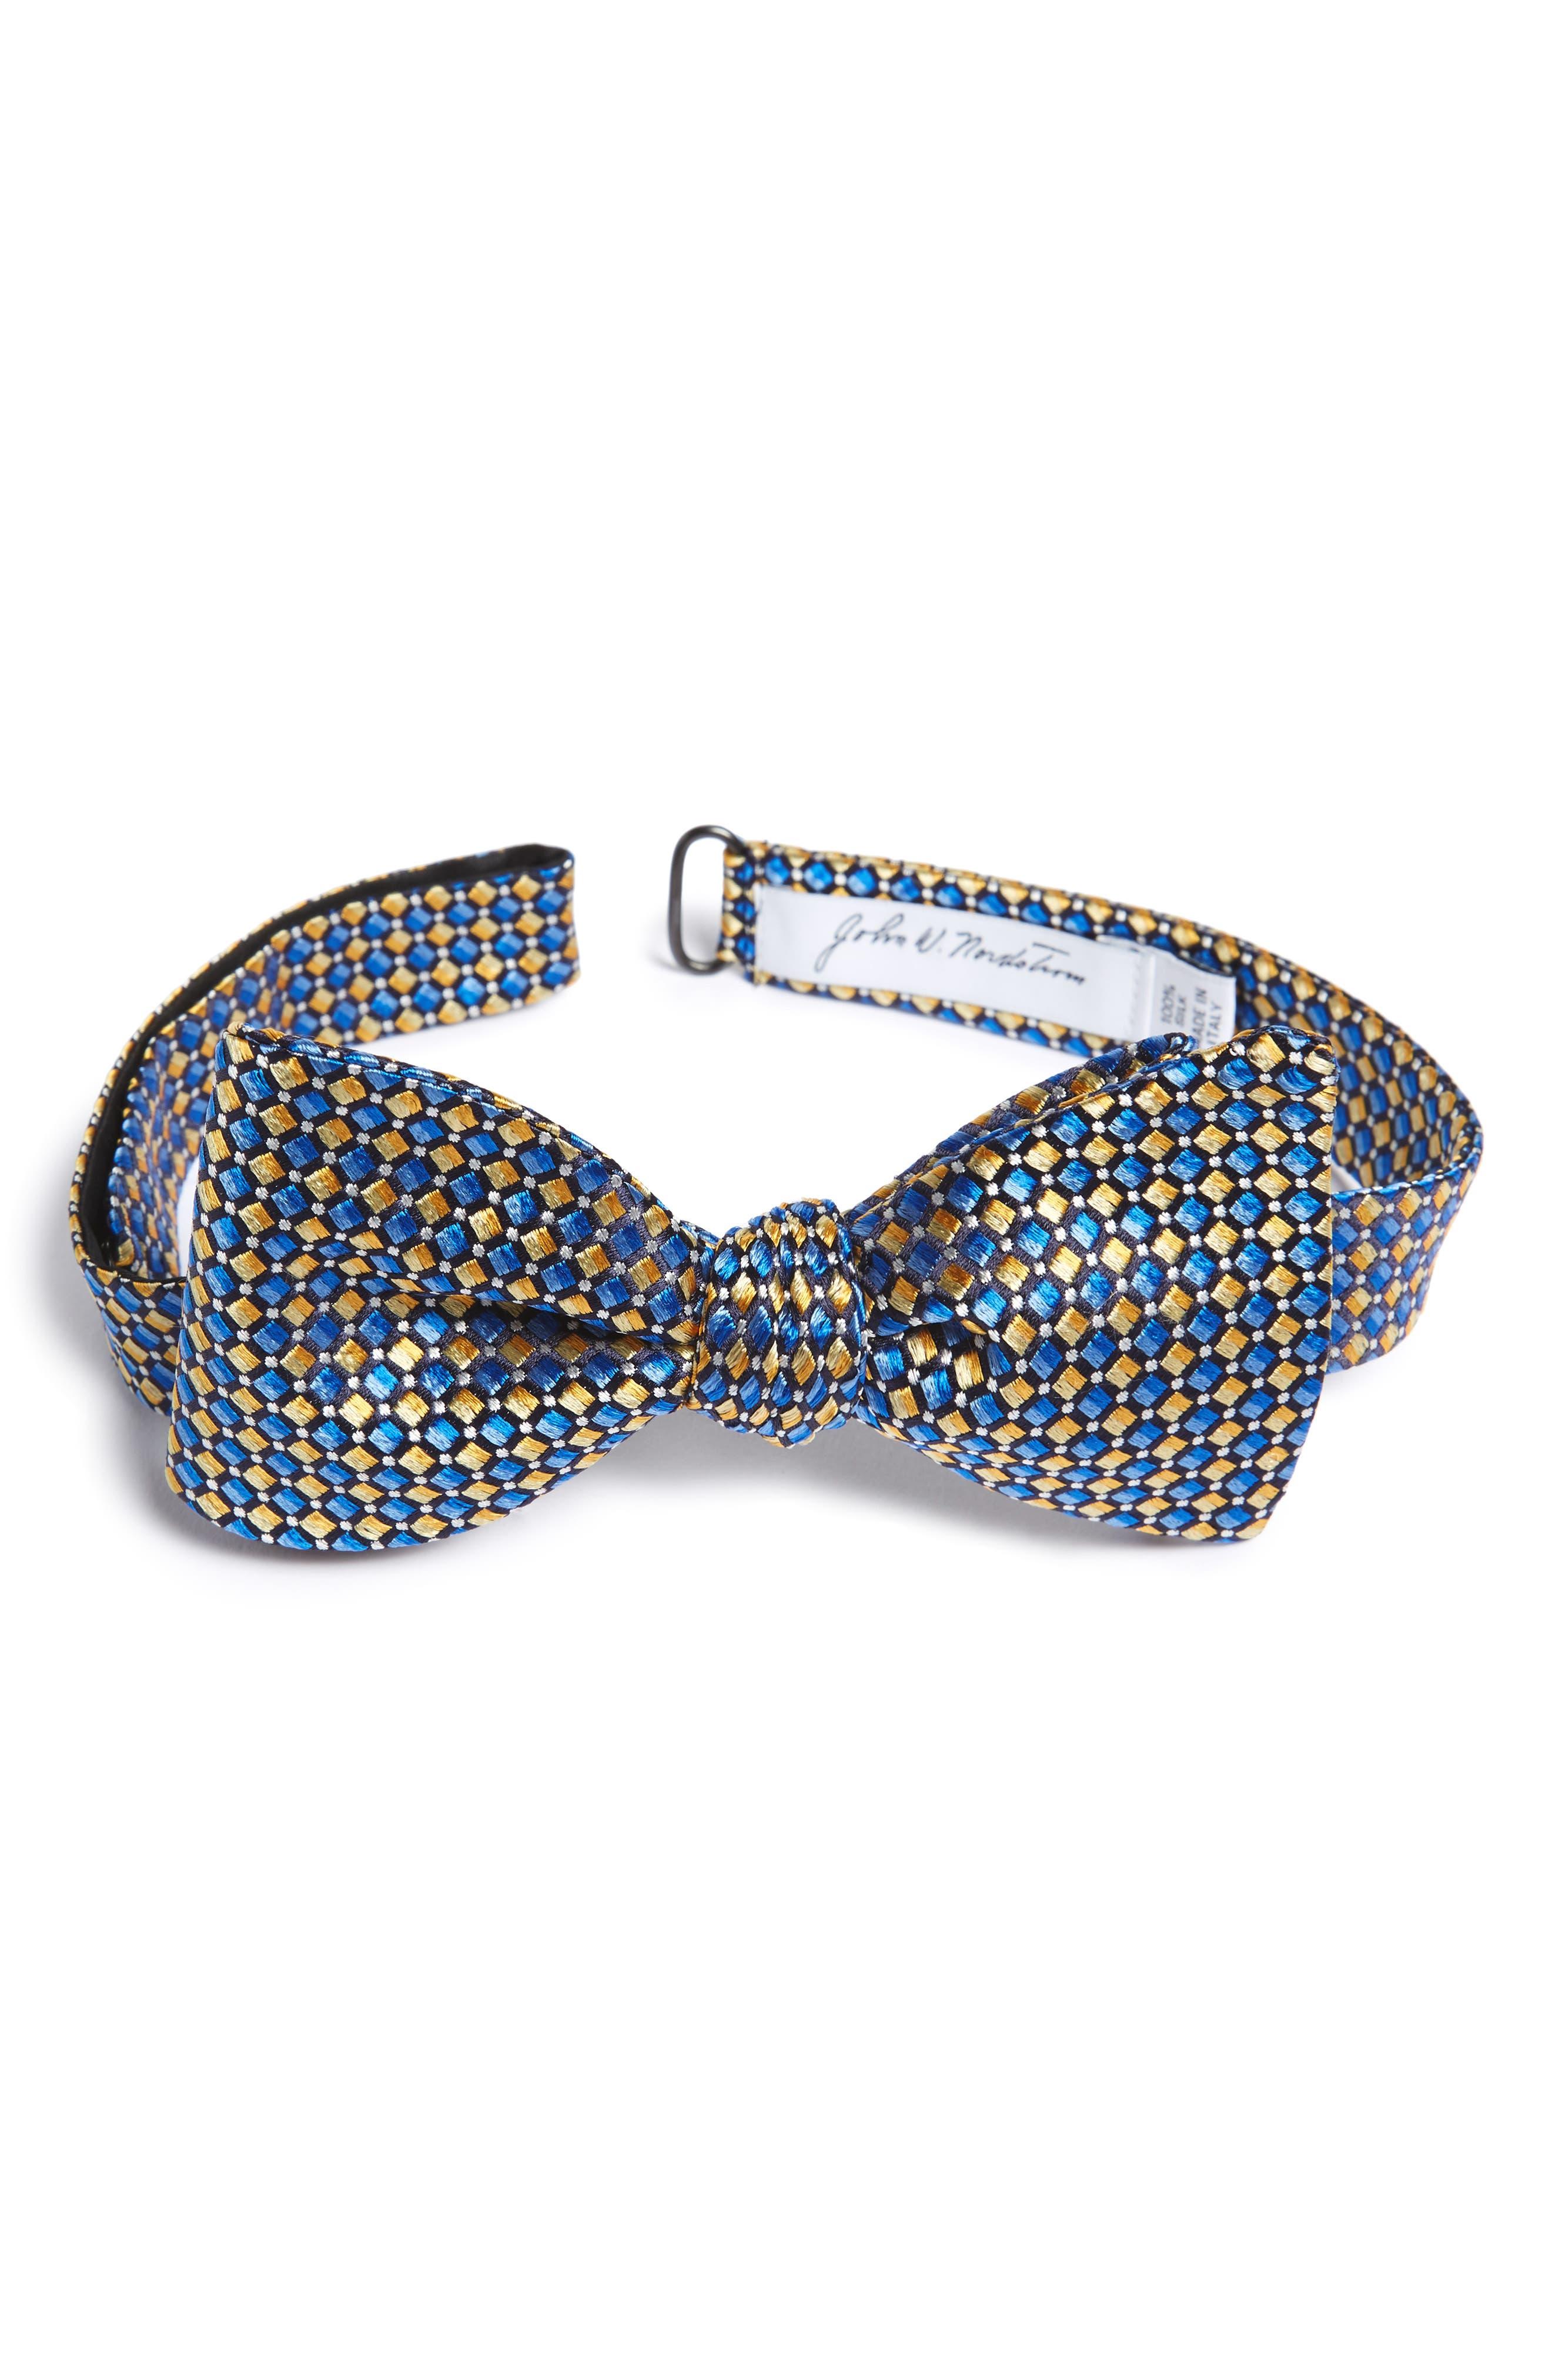 Alternate Image 1 Selected - John W. Nordstrom® Geometric Silk Bow Tie